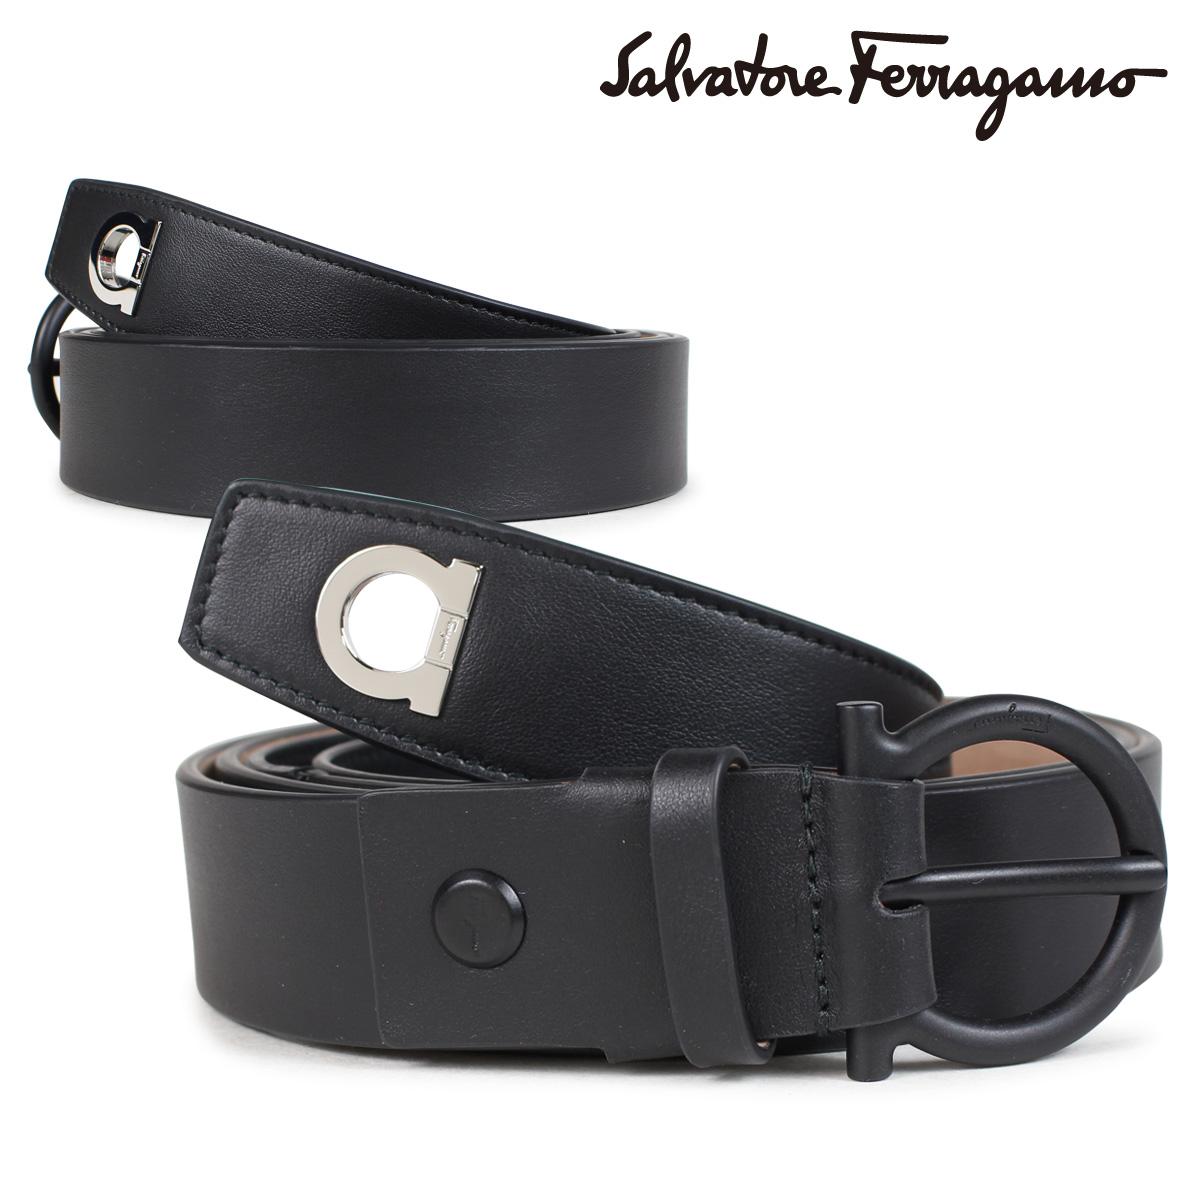 Salvatore Ferragamo ベルト メンズ レザーベルト フェラガモ ADJUSTABLE GANCINI BELT ブラック 679951 [10/23 新入荷]